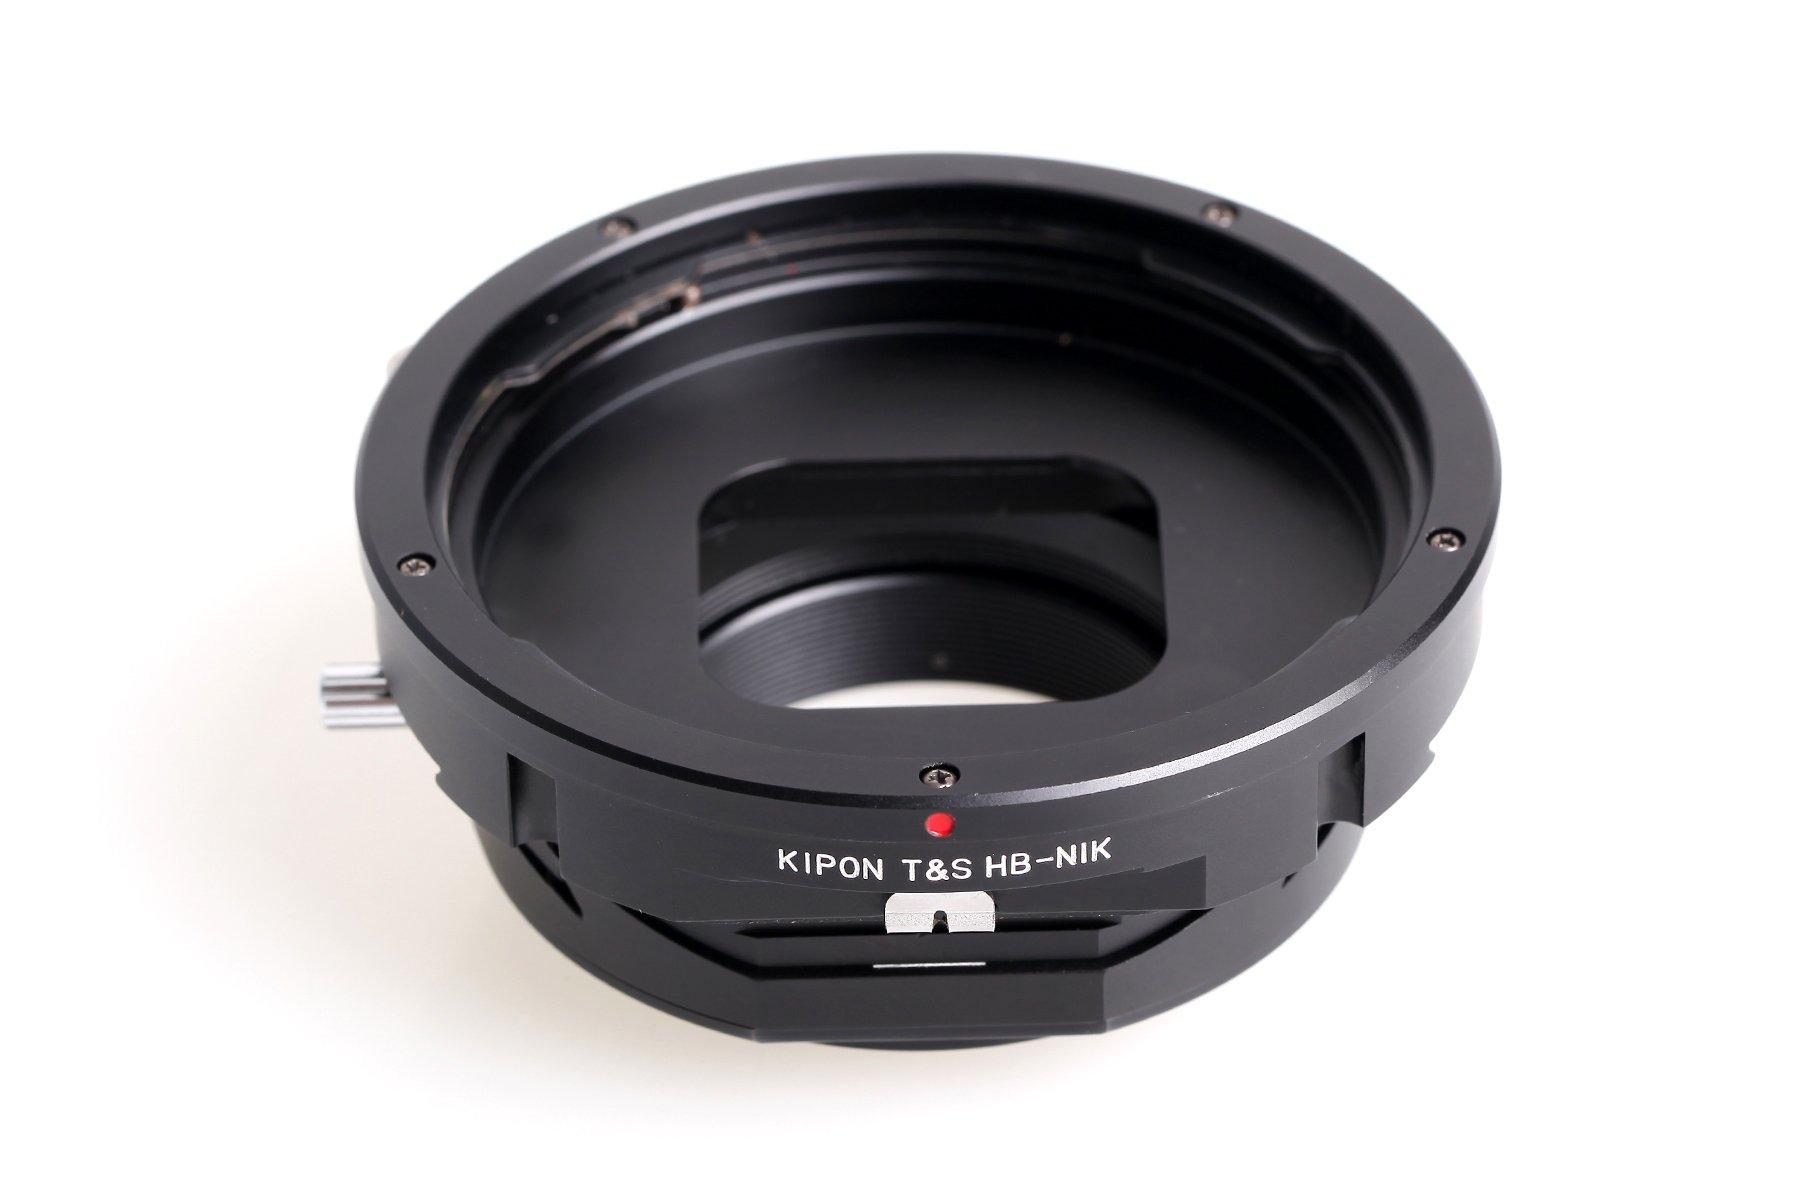 KIPON tilt&shift adaptér objektivu Hasselblad V na tělo Sony A